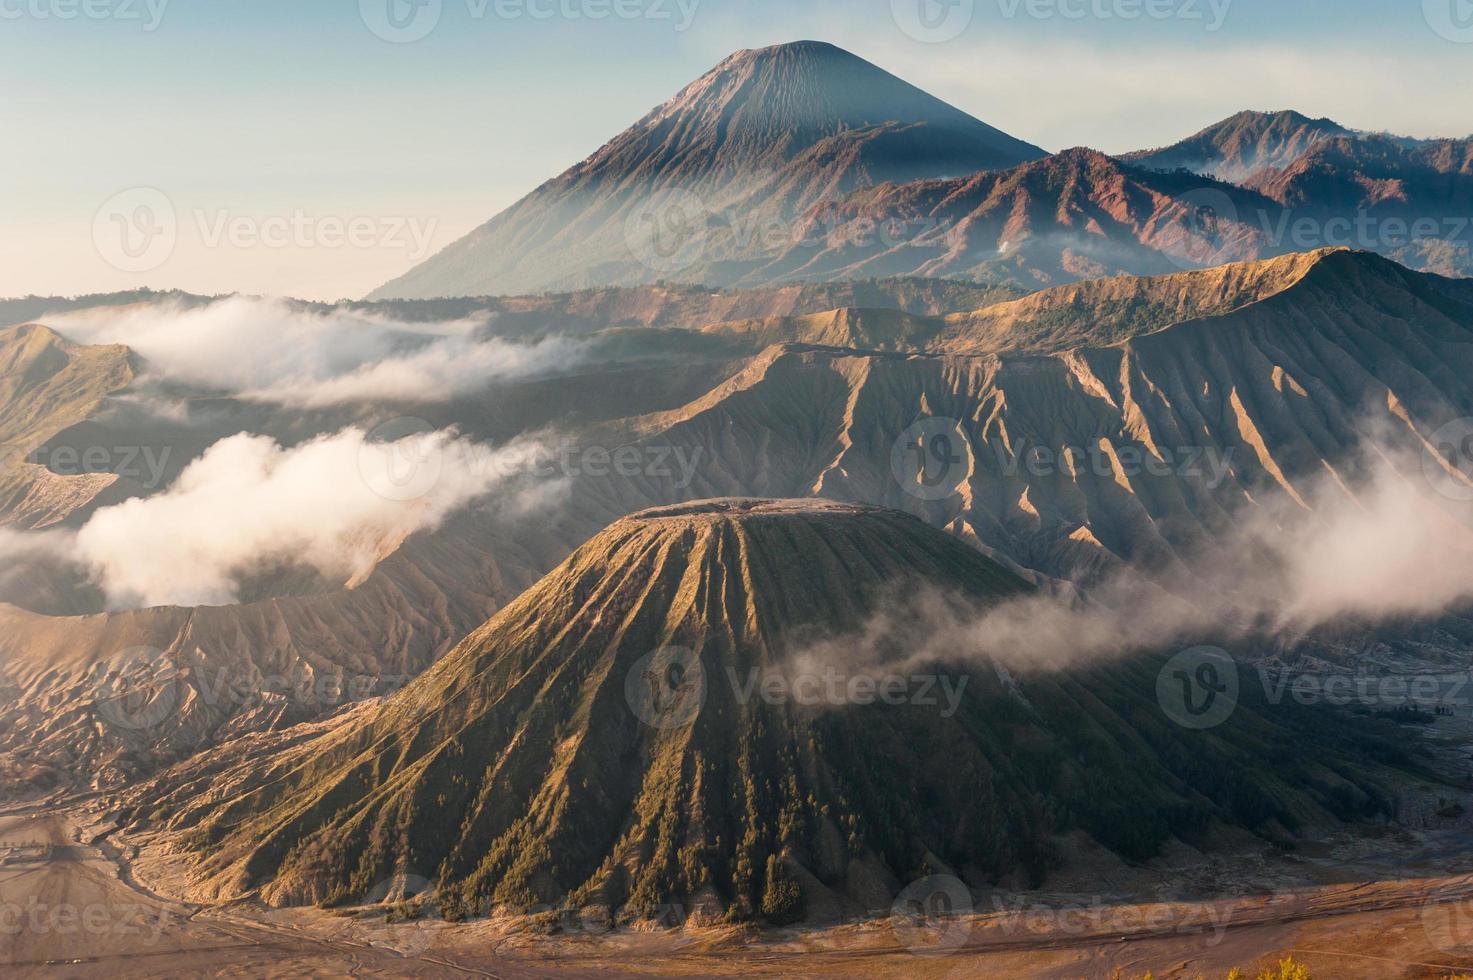 bromo tengger semeru nationalpark. java. indonesien foto